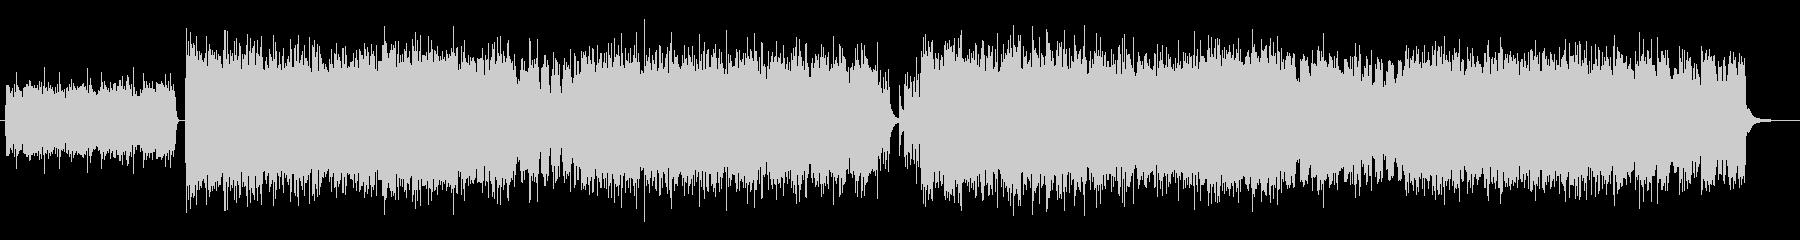 HEAVY・DARK・DEATH 290の未再生の波形